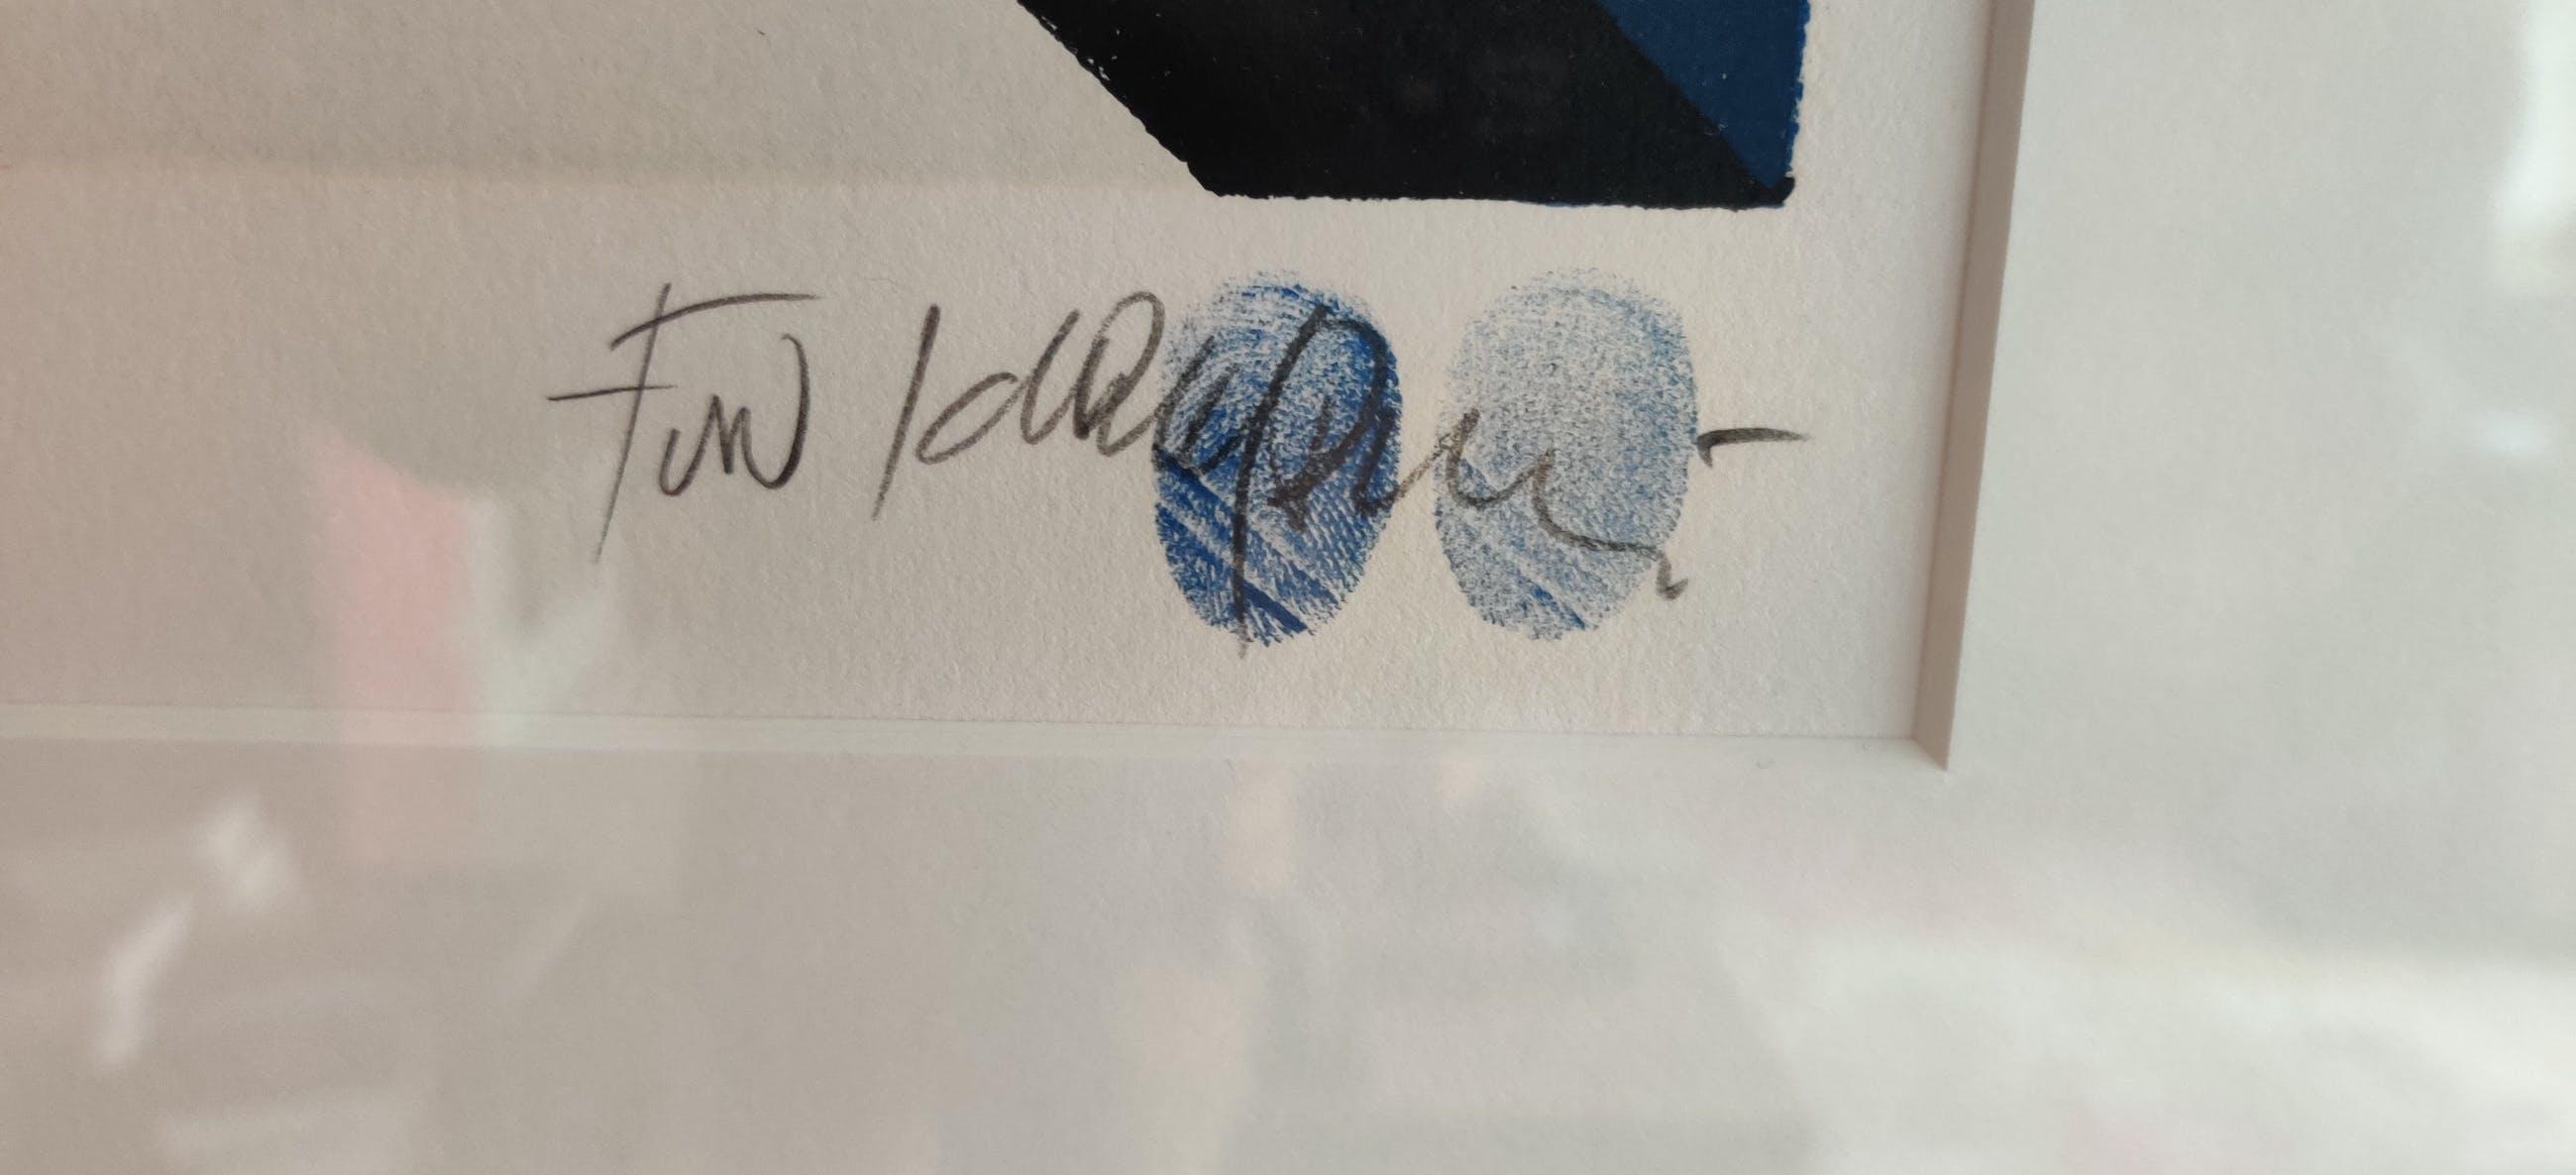 Fon Klement - Rose sur fond bleu - H.C.eigendruk kopen? Bied vanaf 195!